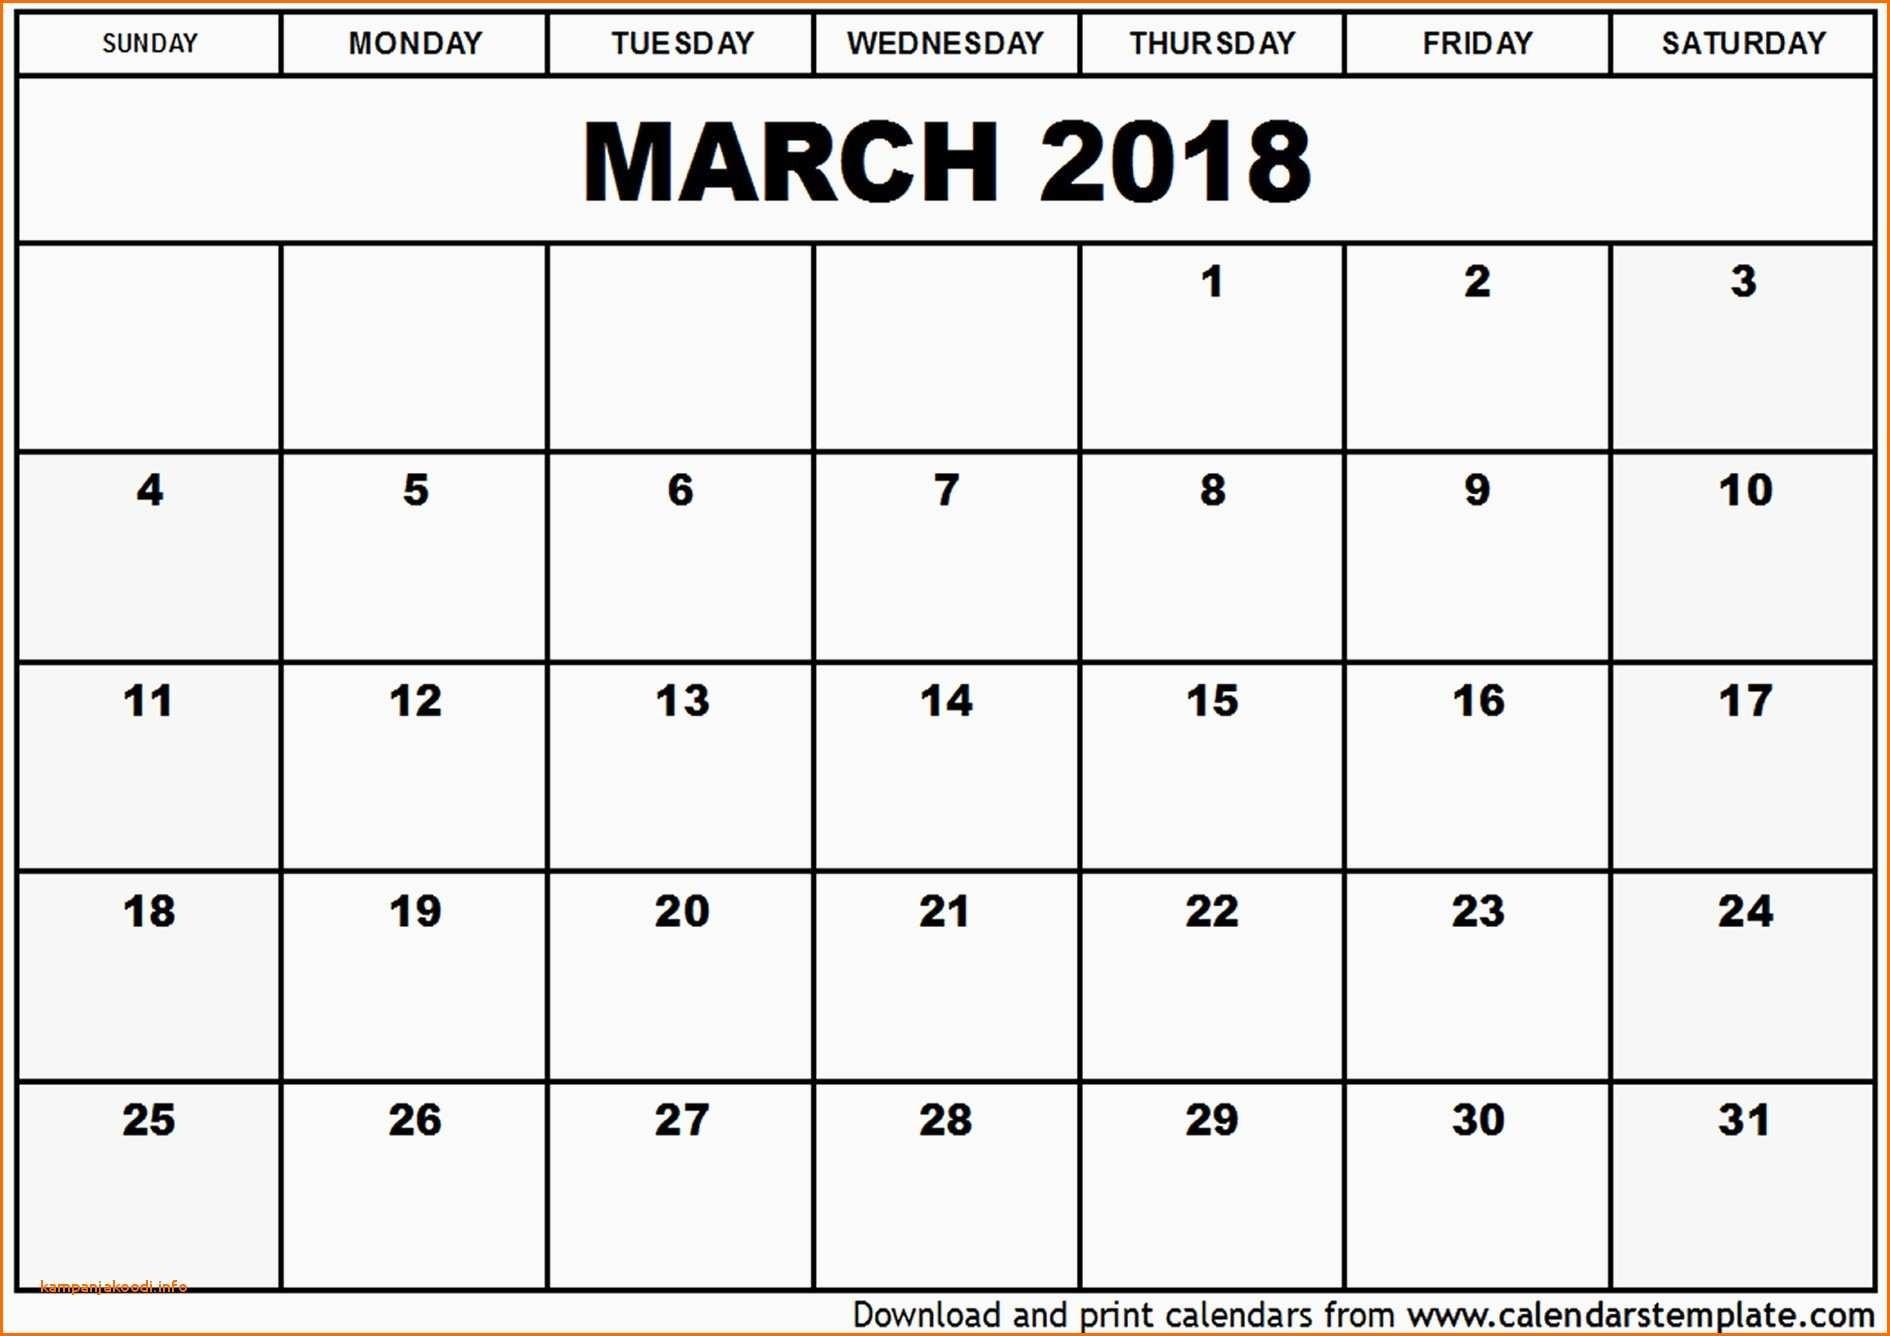 Planners Printable Calendars Printable Calendar for February 2018 with Holidays